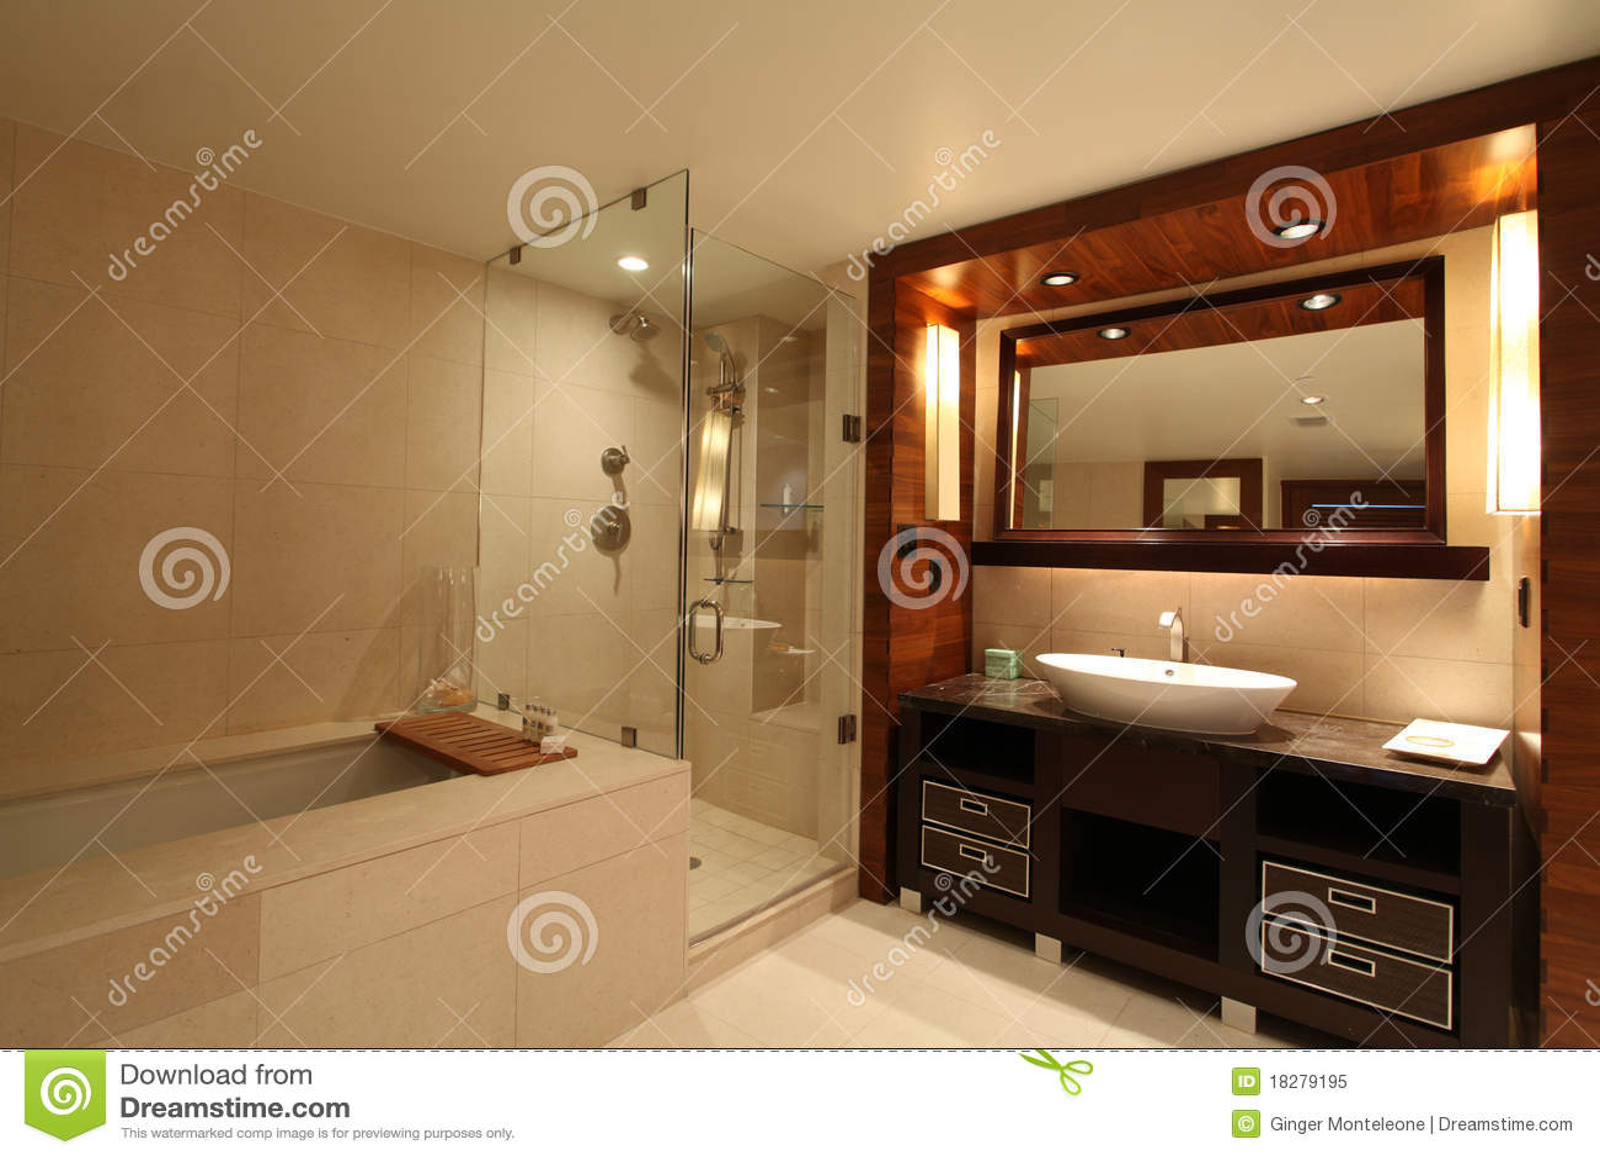 Romantic Bathroom Royalty Free Stock Photo Image 18279195